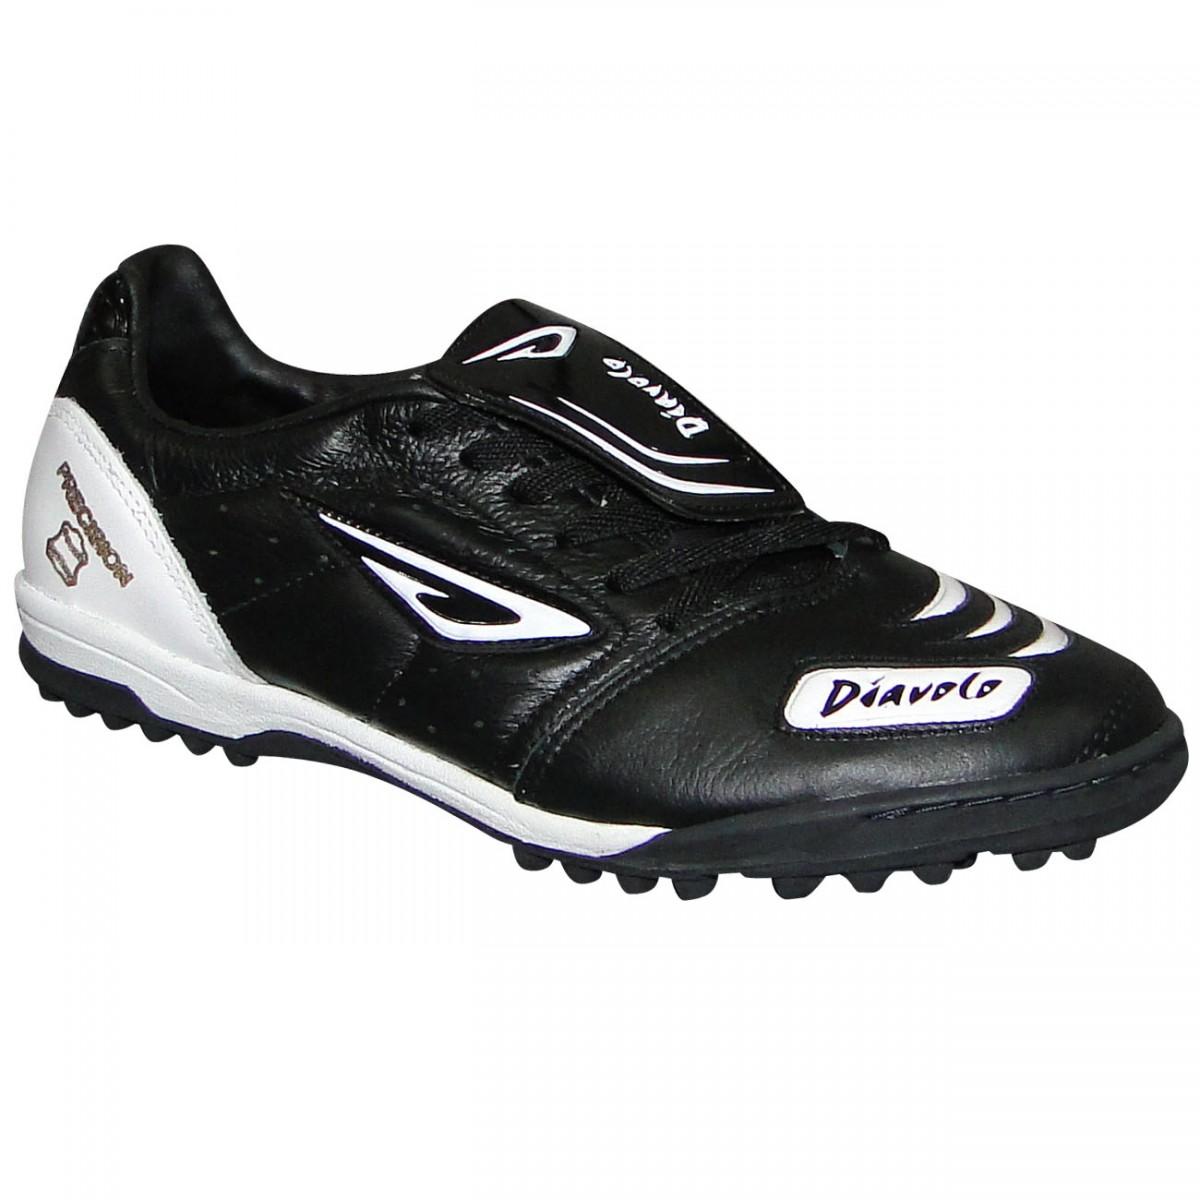 a2a97e3539 Chuteira Society Diavolo Precision HG 9164 - Preto Branco - Chuteira Nike